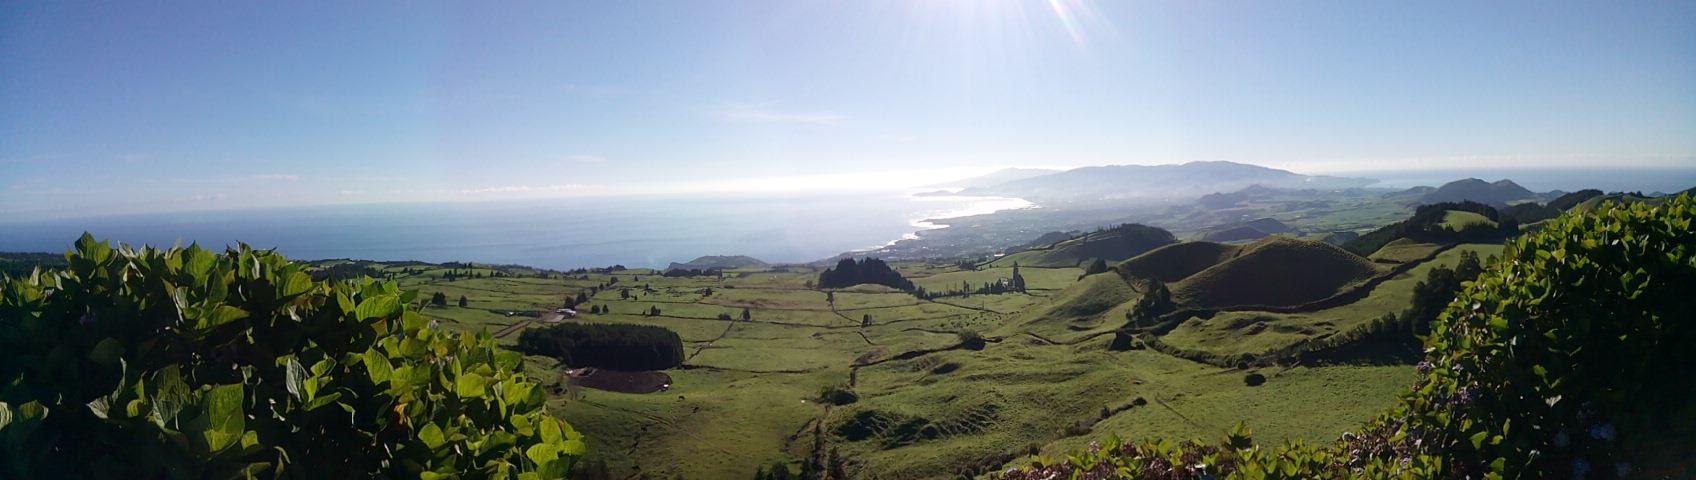 SAO MIGUEL | Andoni Garai (Oñati). Azores.